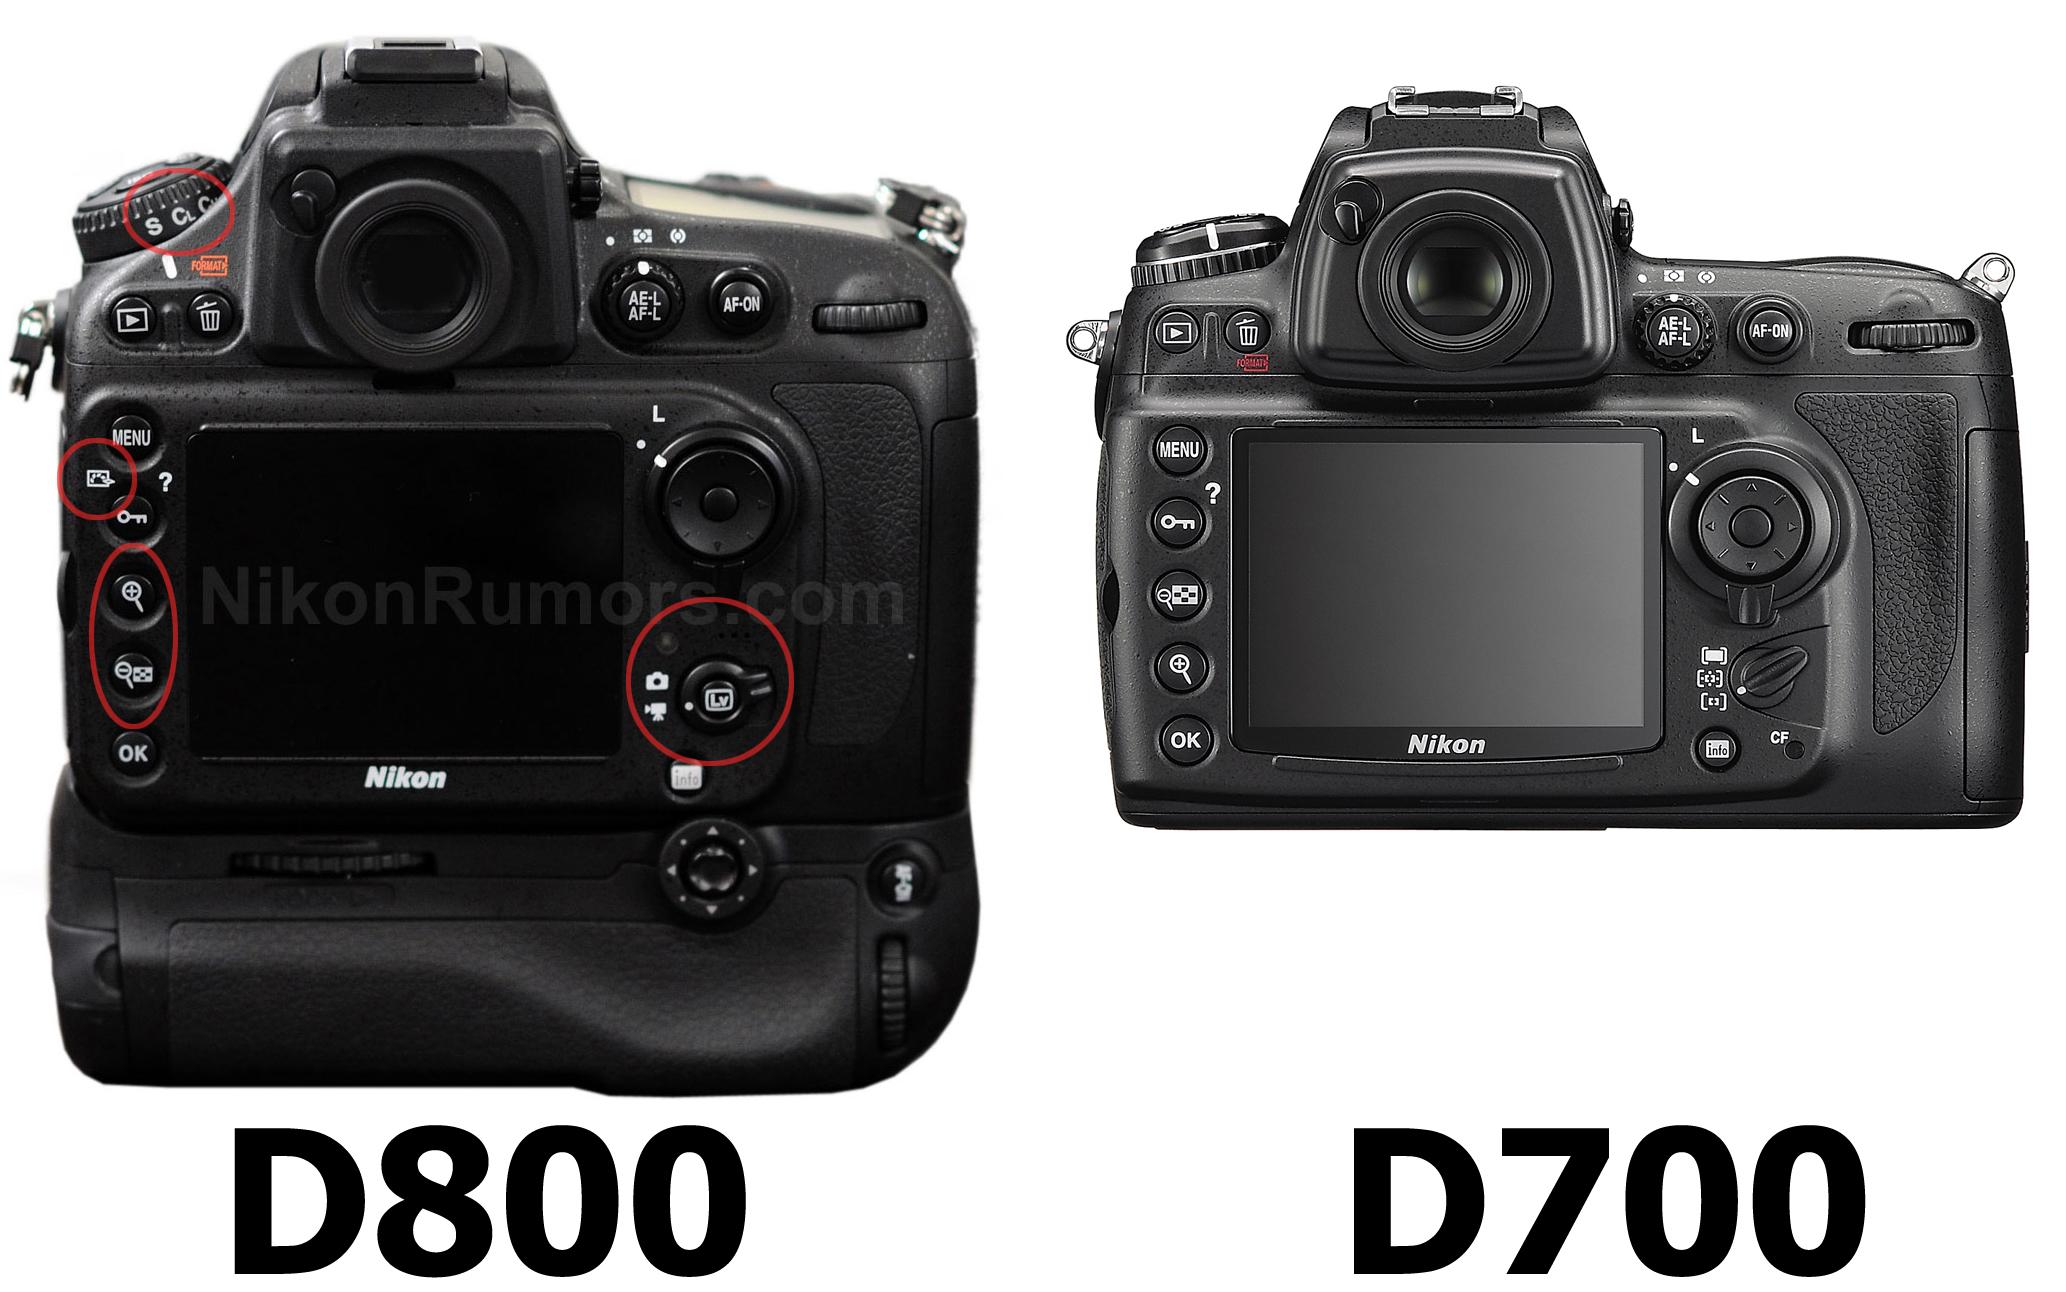 Nikon D800: The mystery of 36